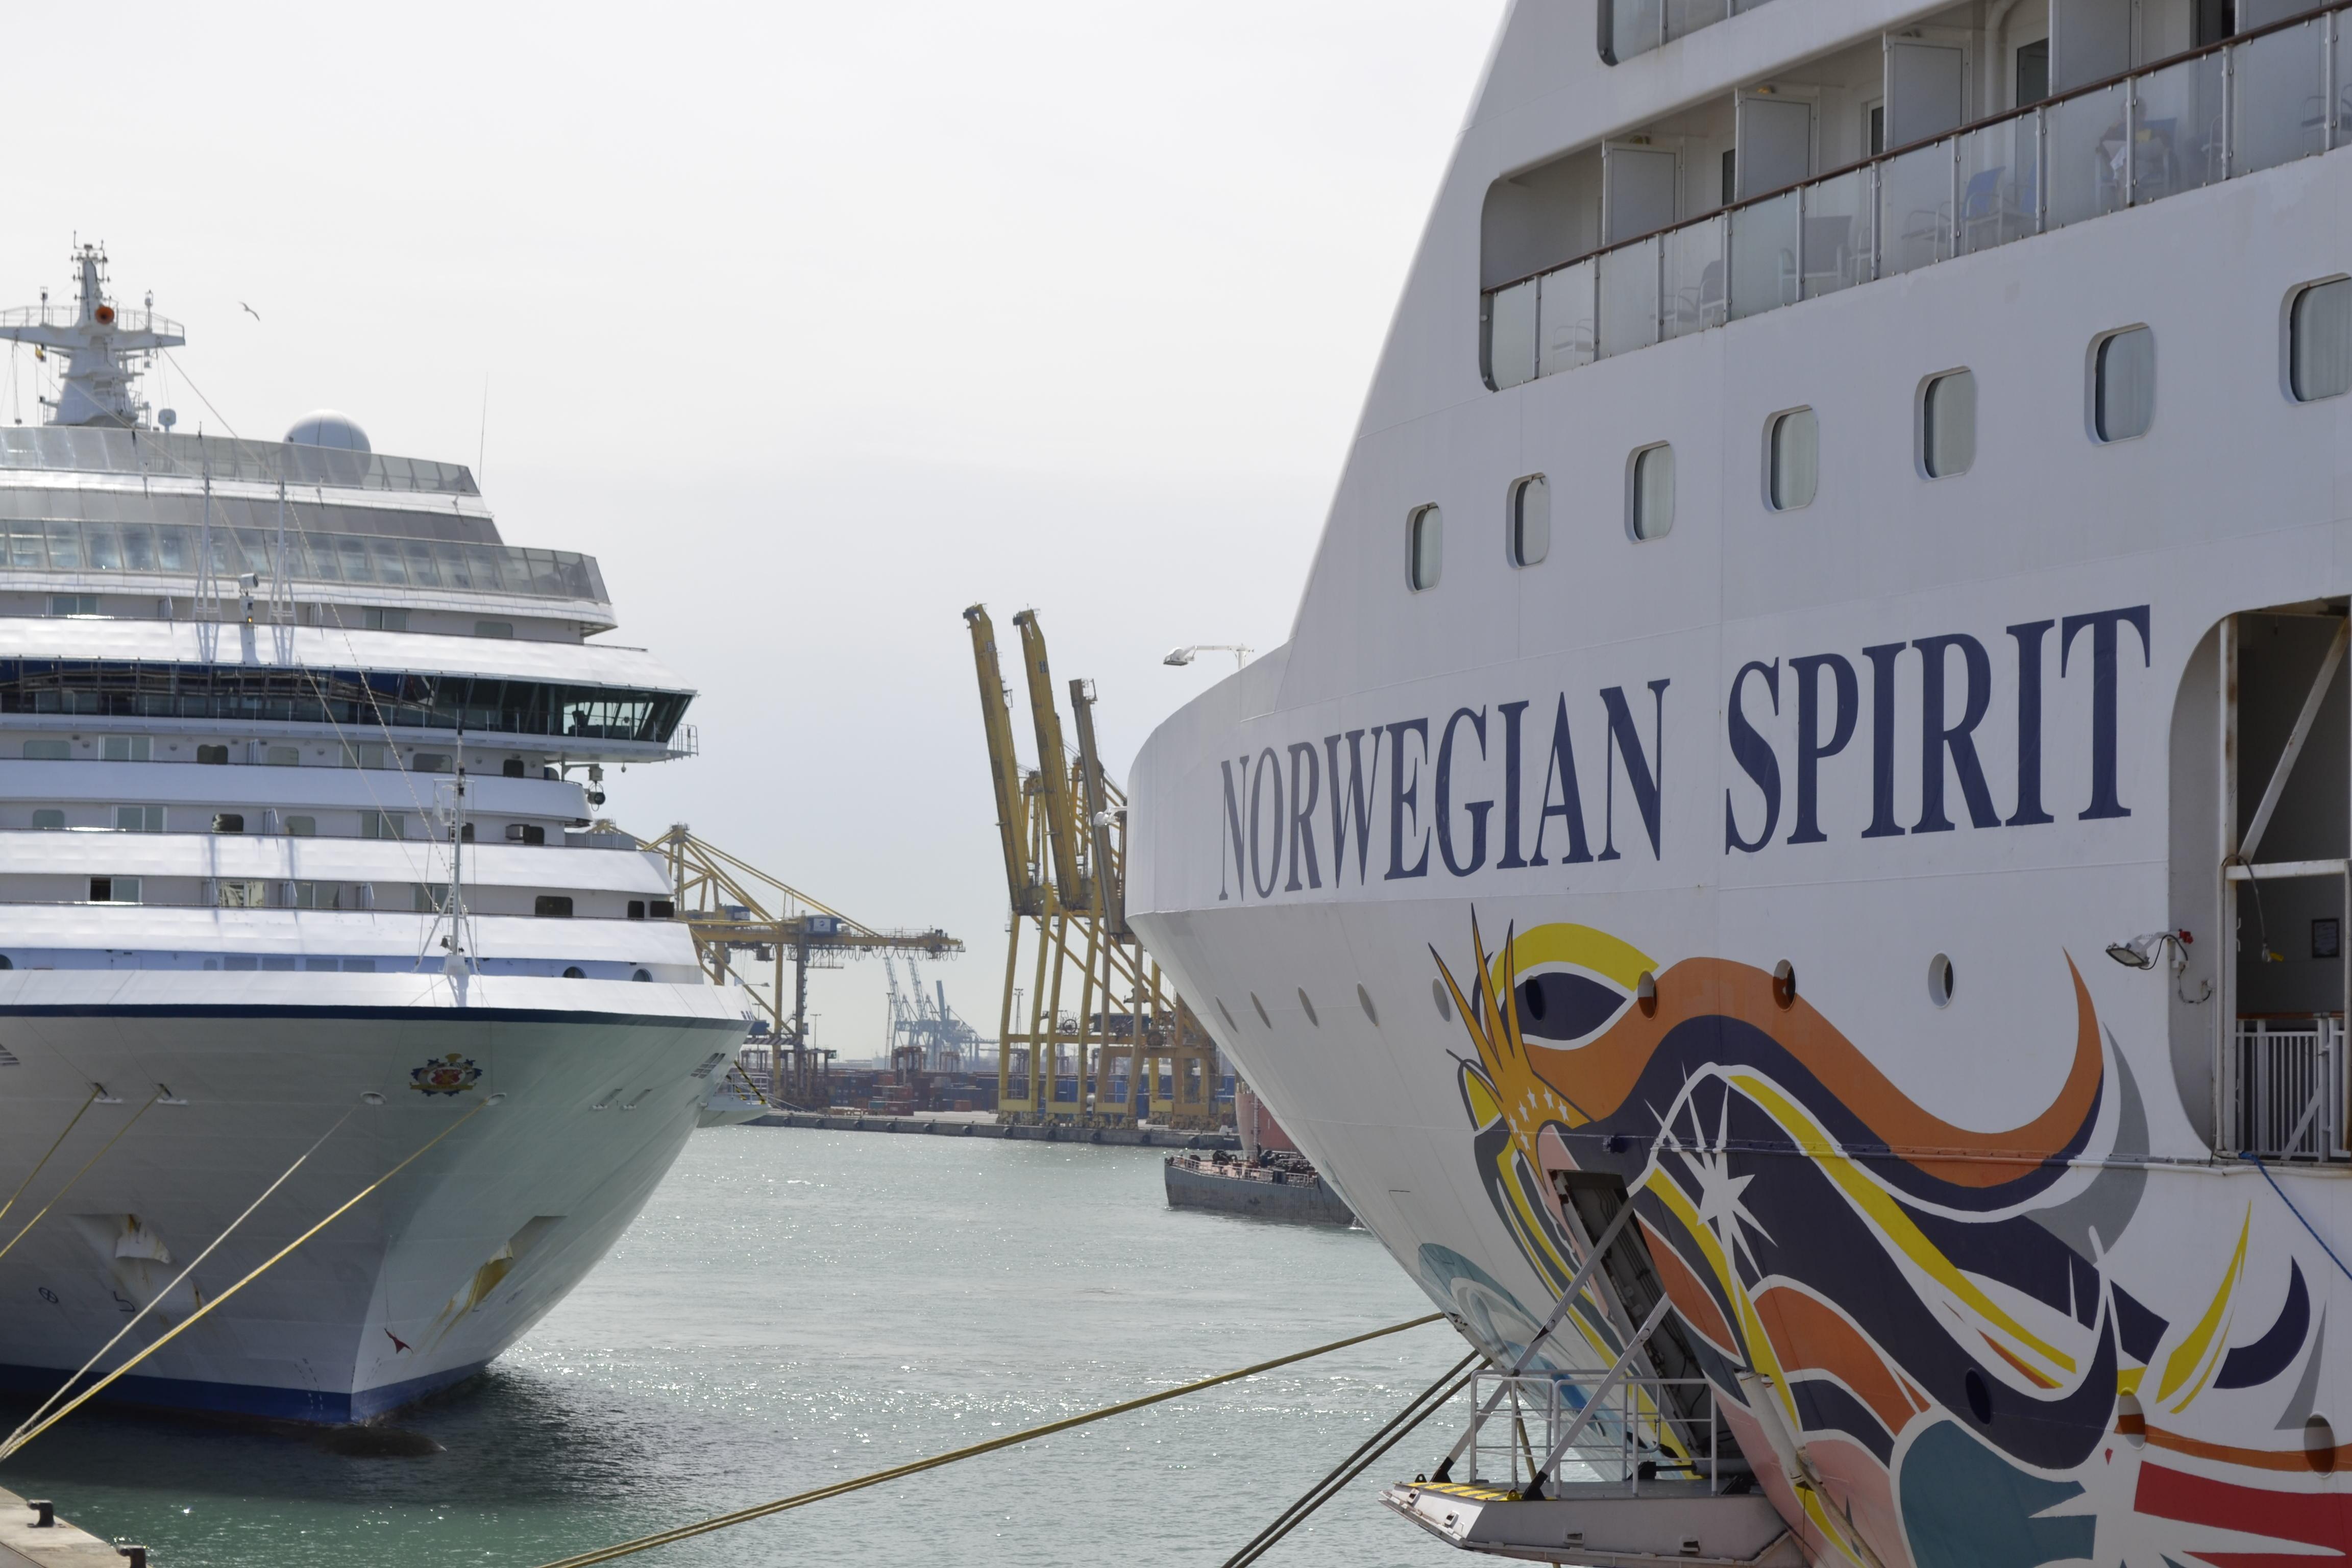 fotos del Norwegian Spirit